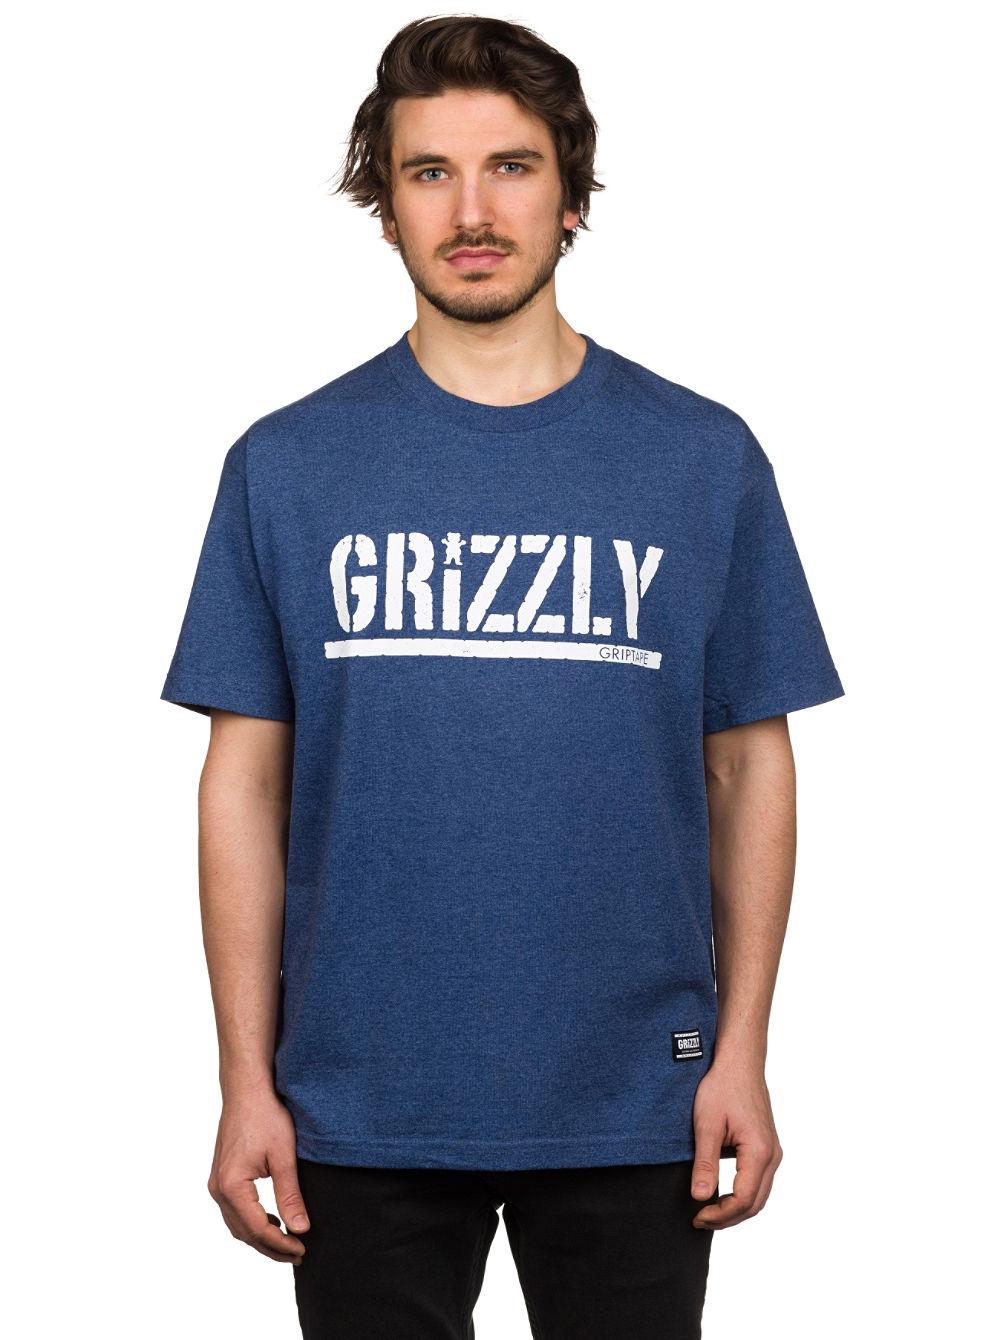 rough-stamp-t-shirt